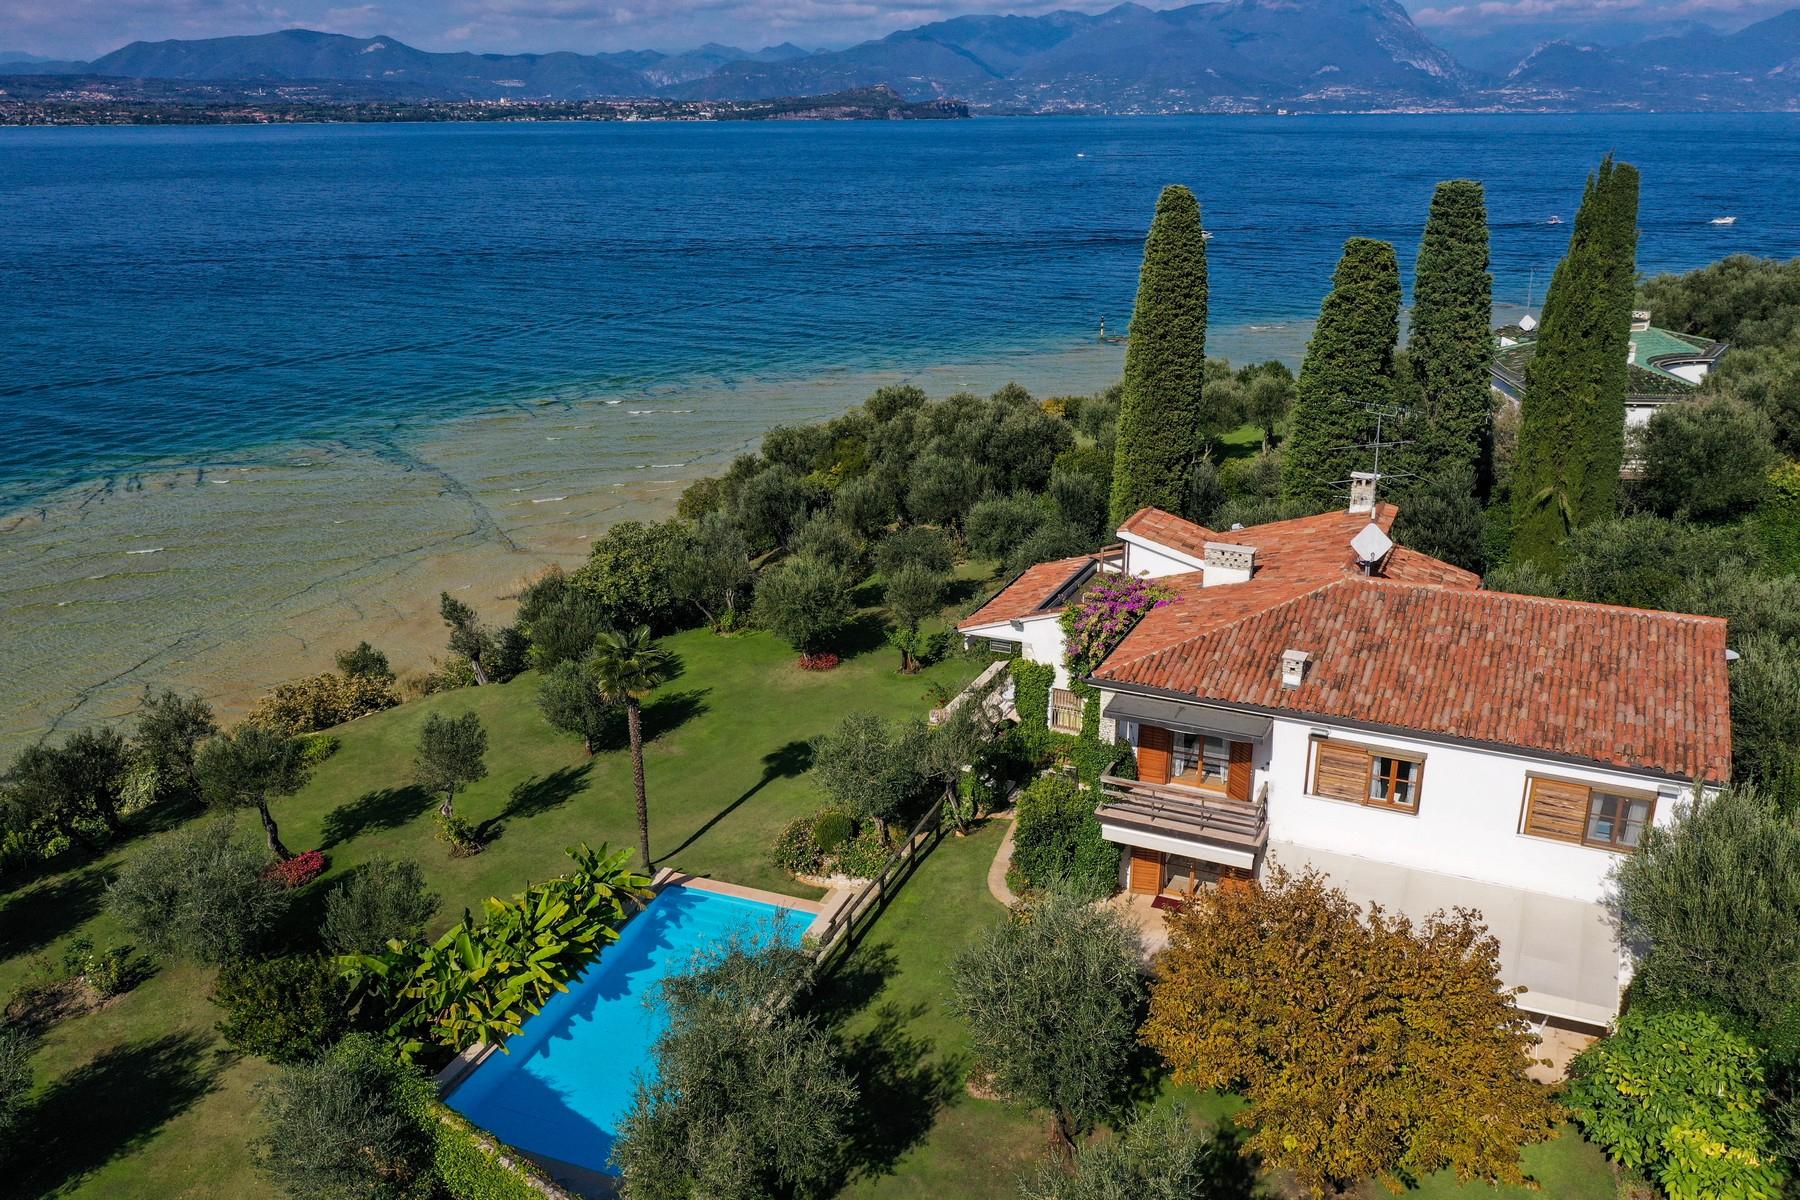 Villa in Vendita a Sirmione:  5 locali, 500 mq  - Foto 1